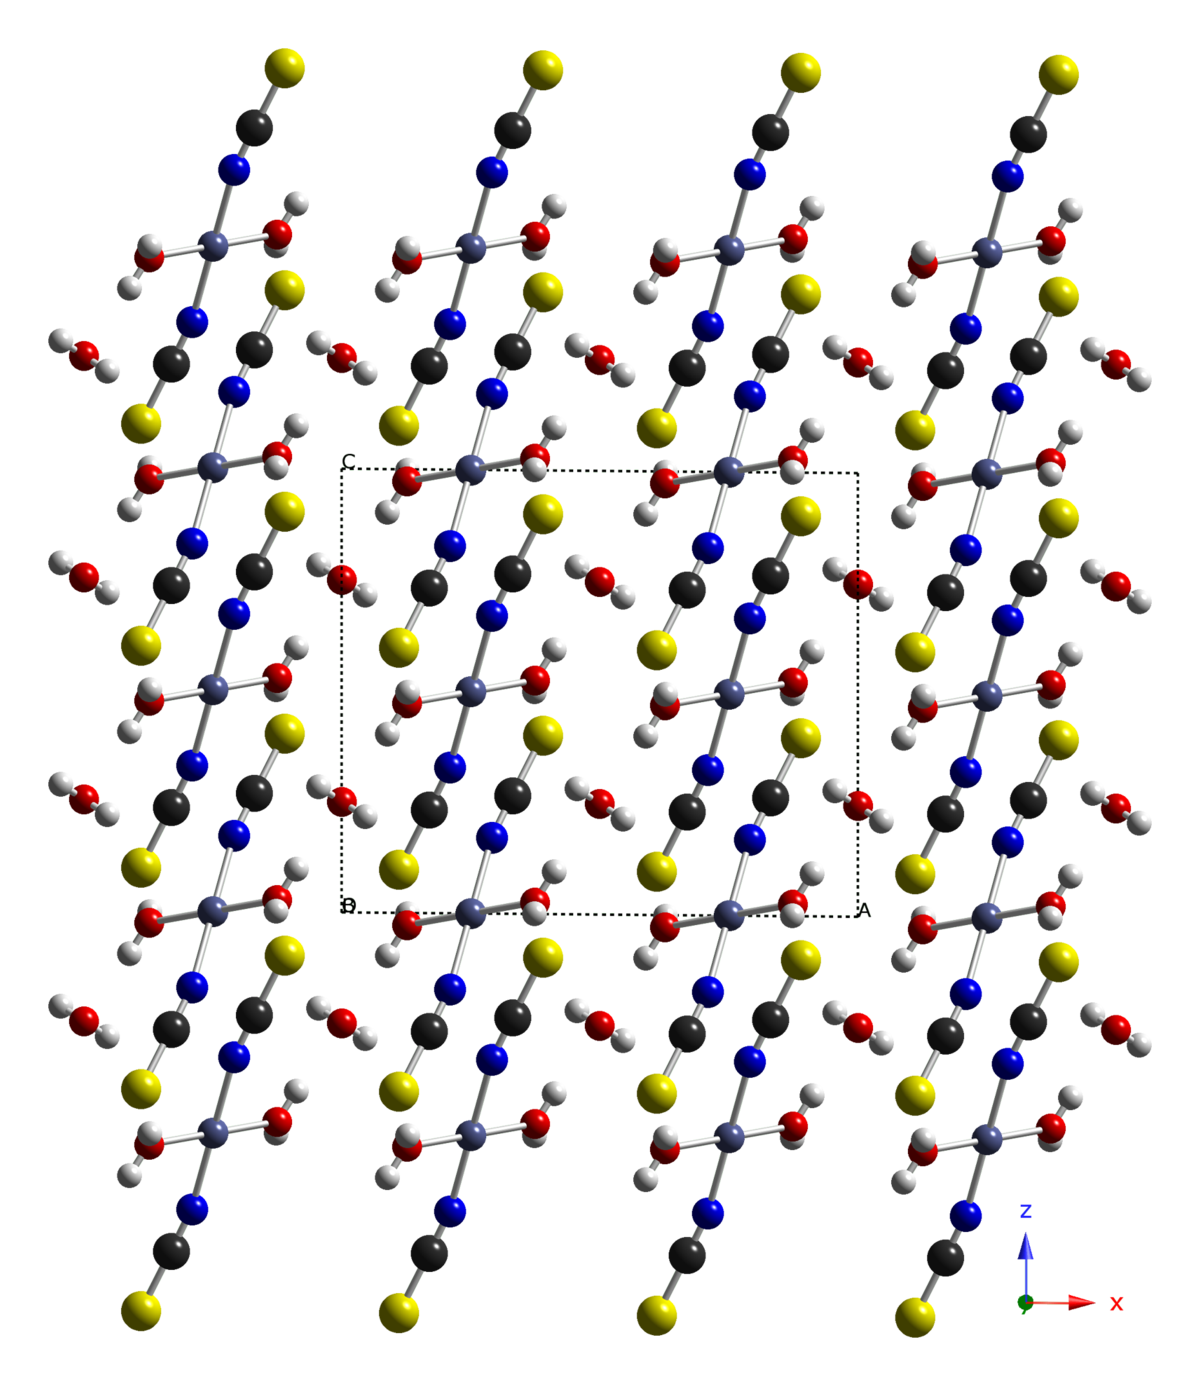 Cobalt(II) thiocyanate - Wikipedia